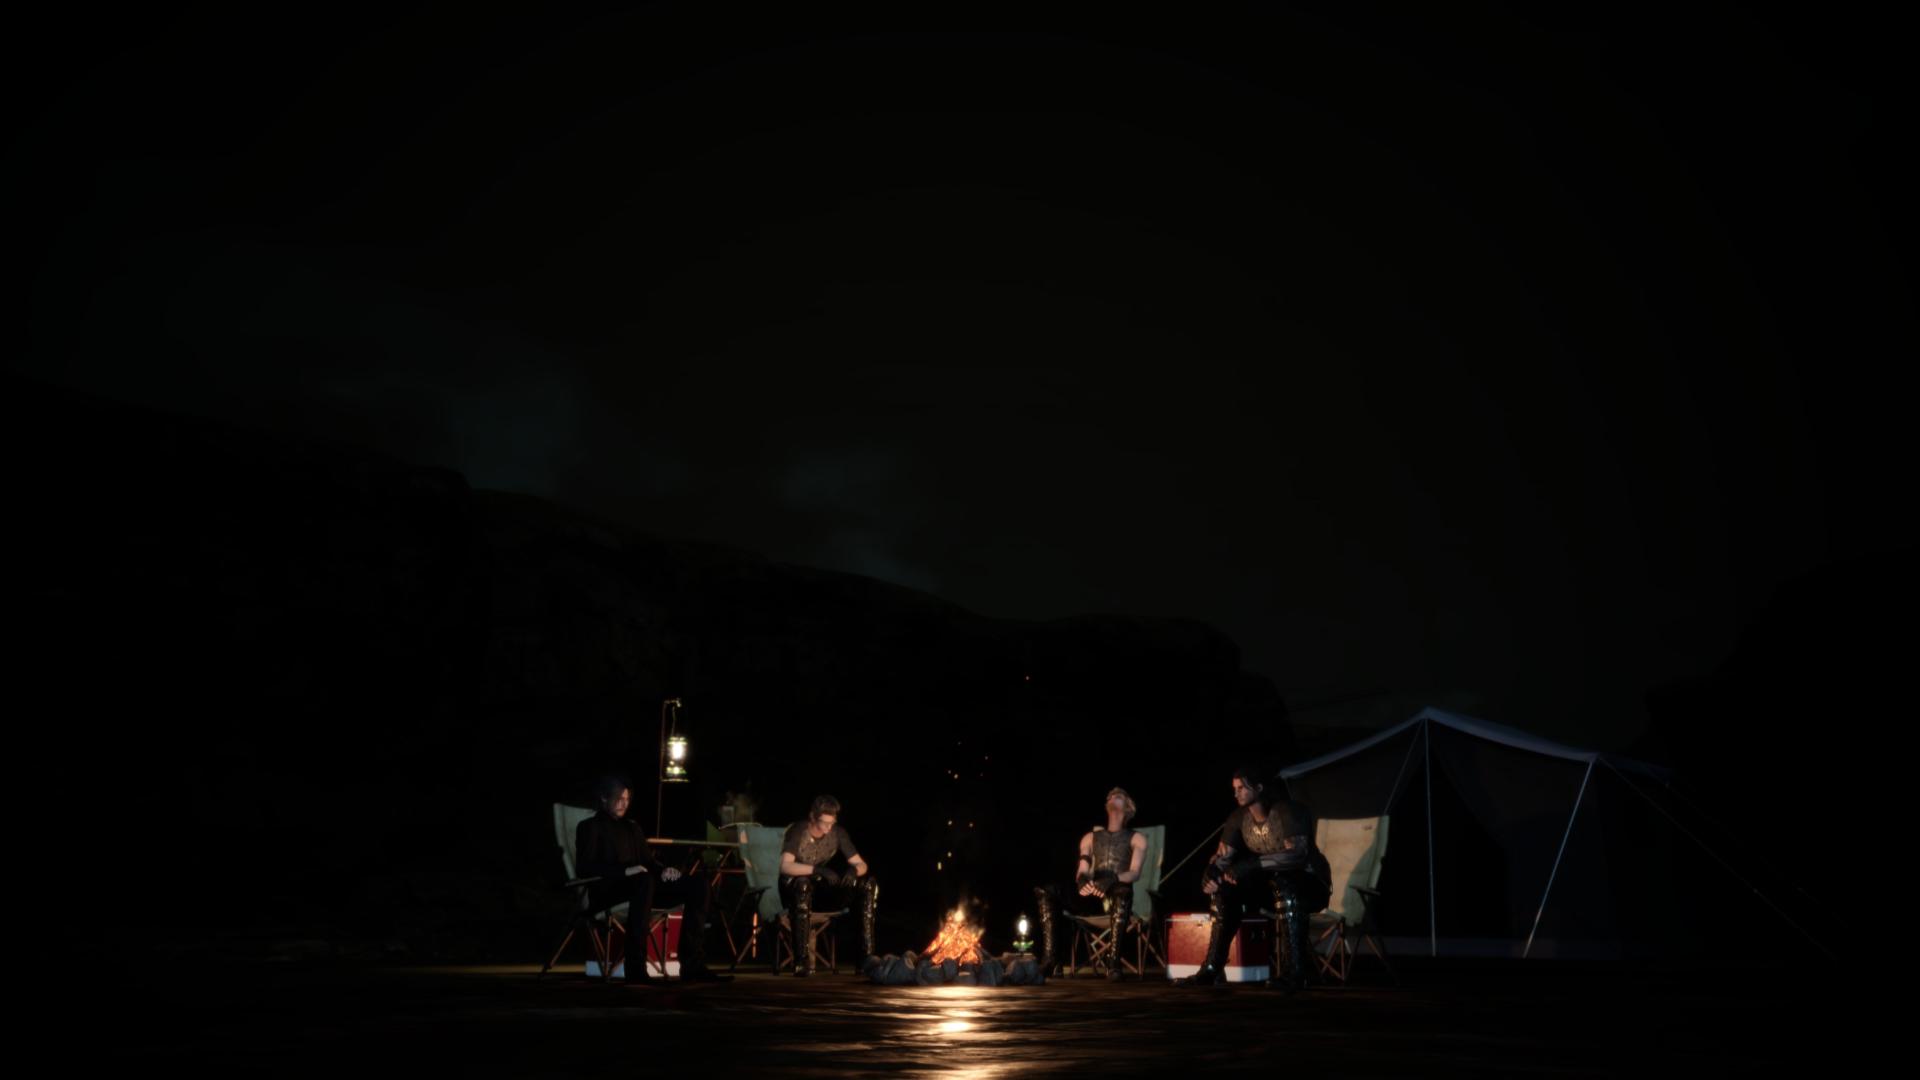 [1920x1080] FFXV the last campfire ( spoiler ) Need